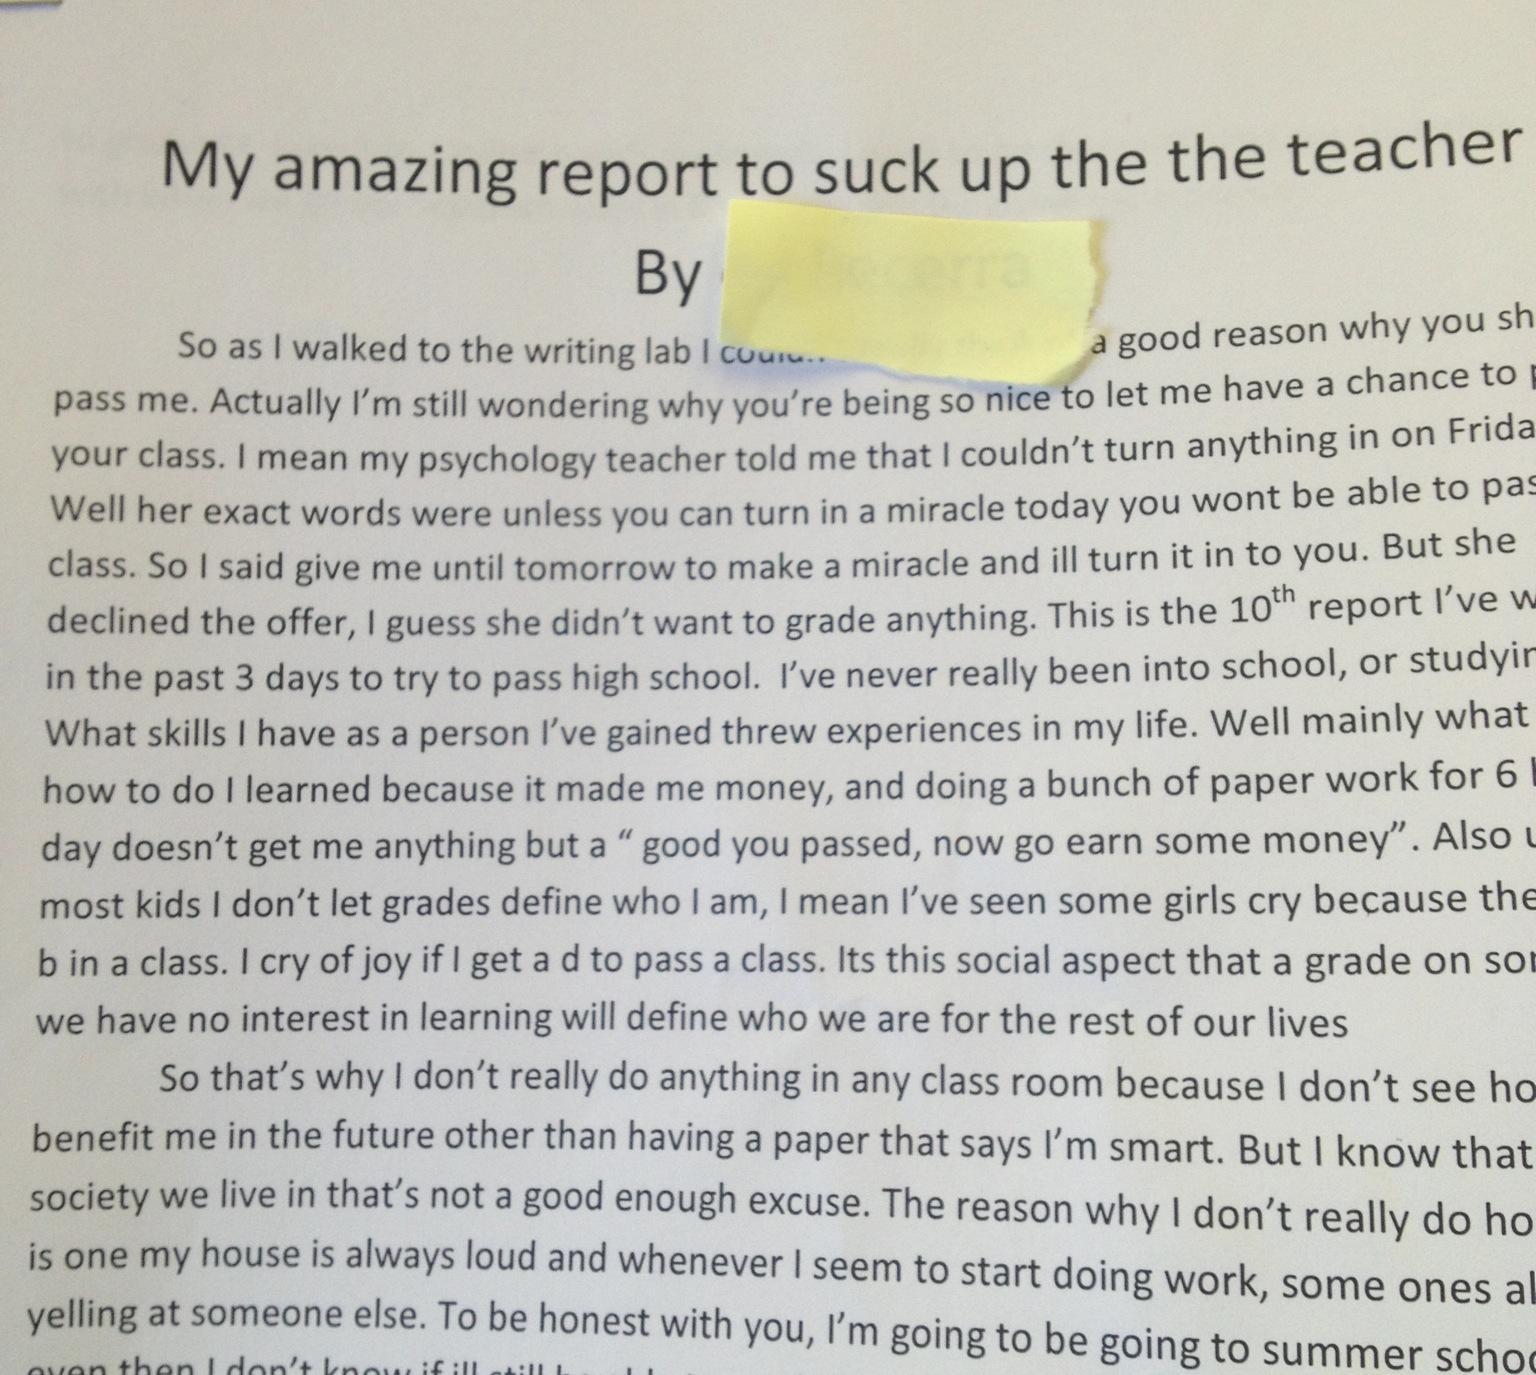 essay on rainy day for kids lysistrata essay topics lysistrata essay